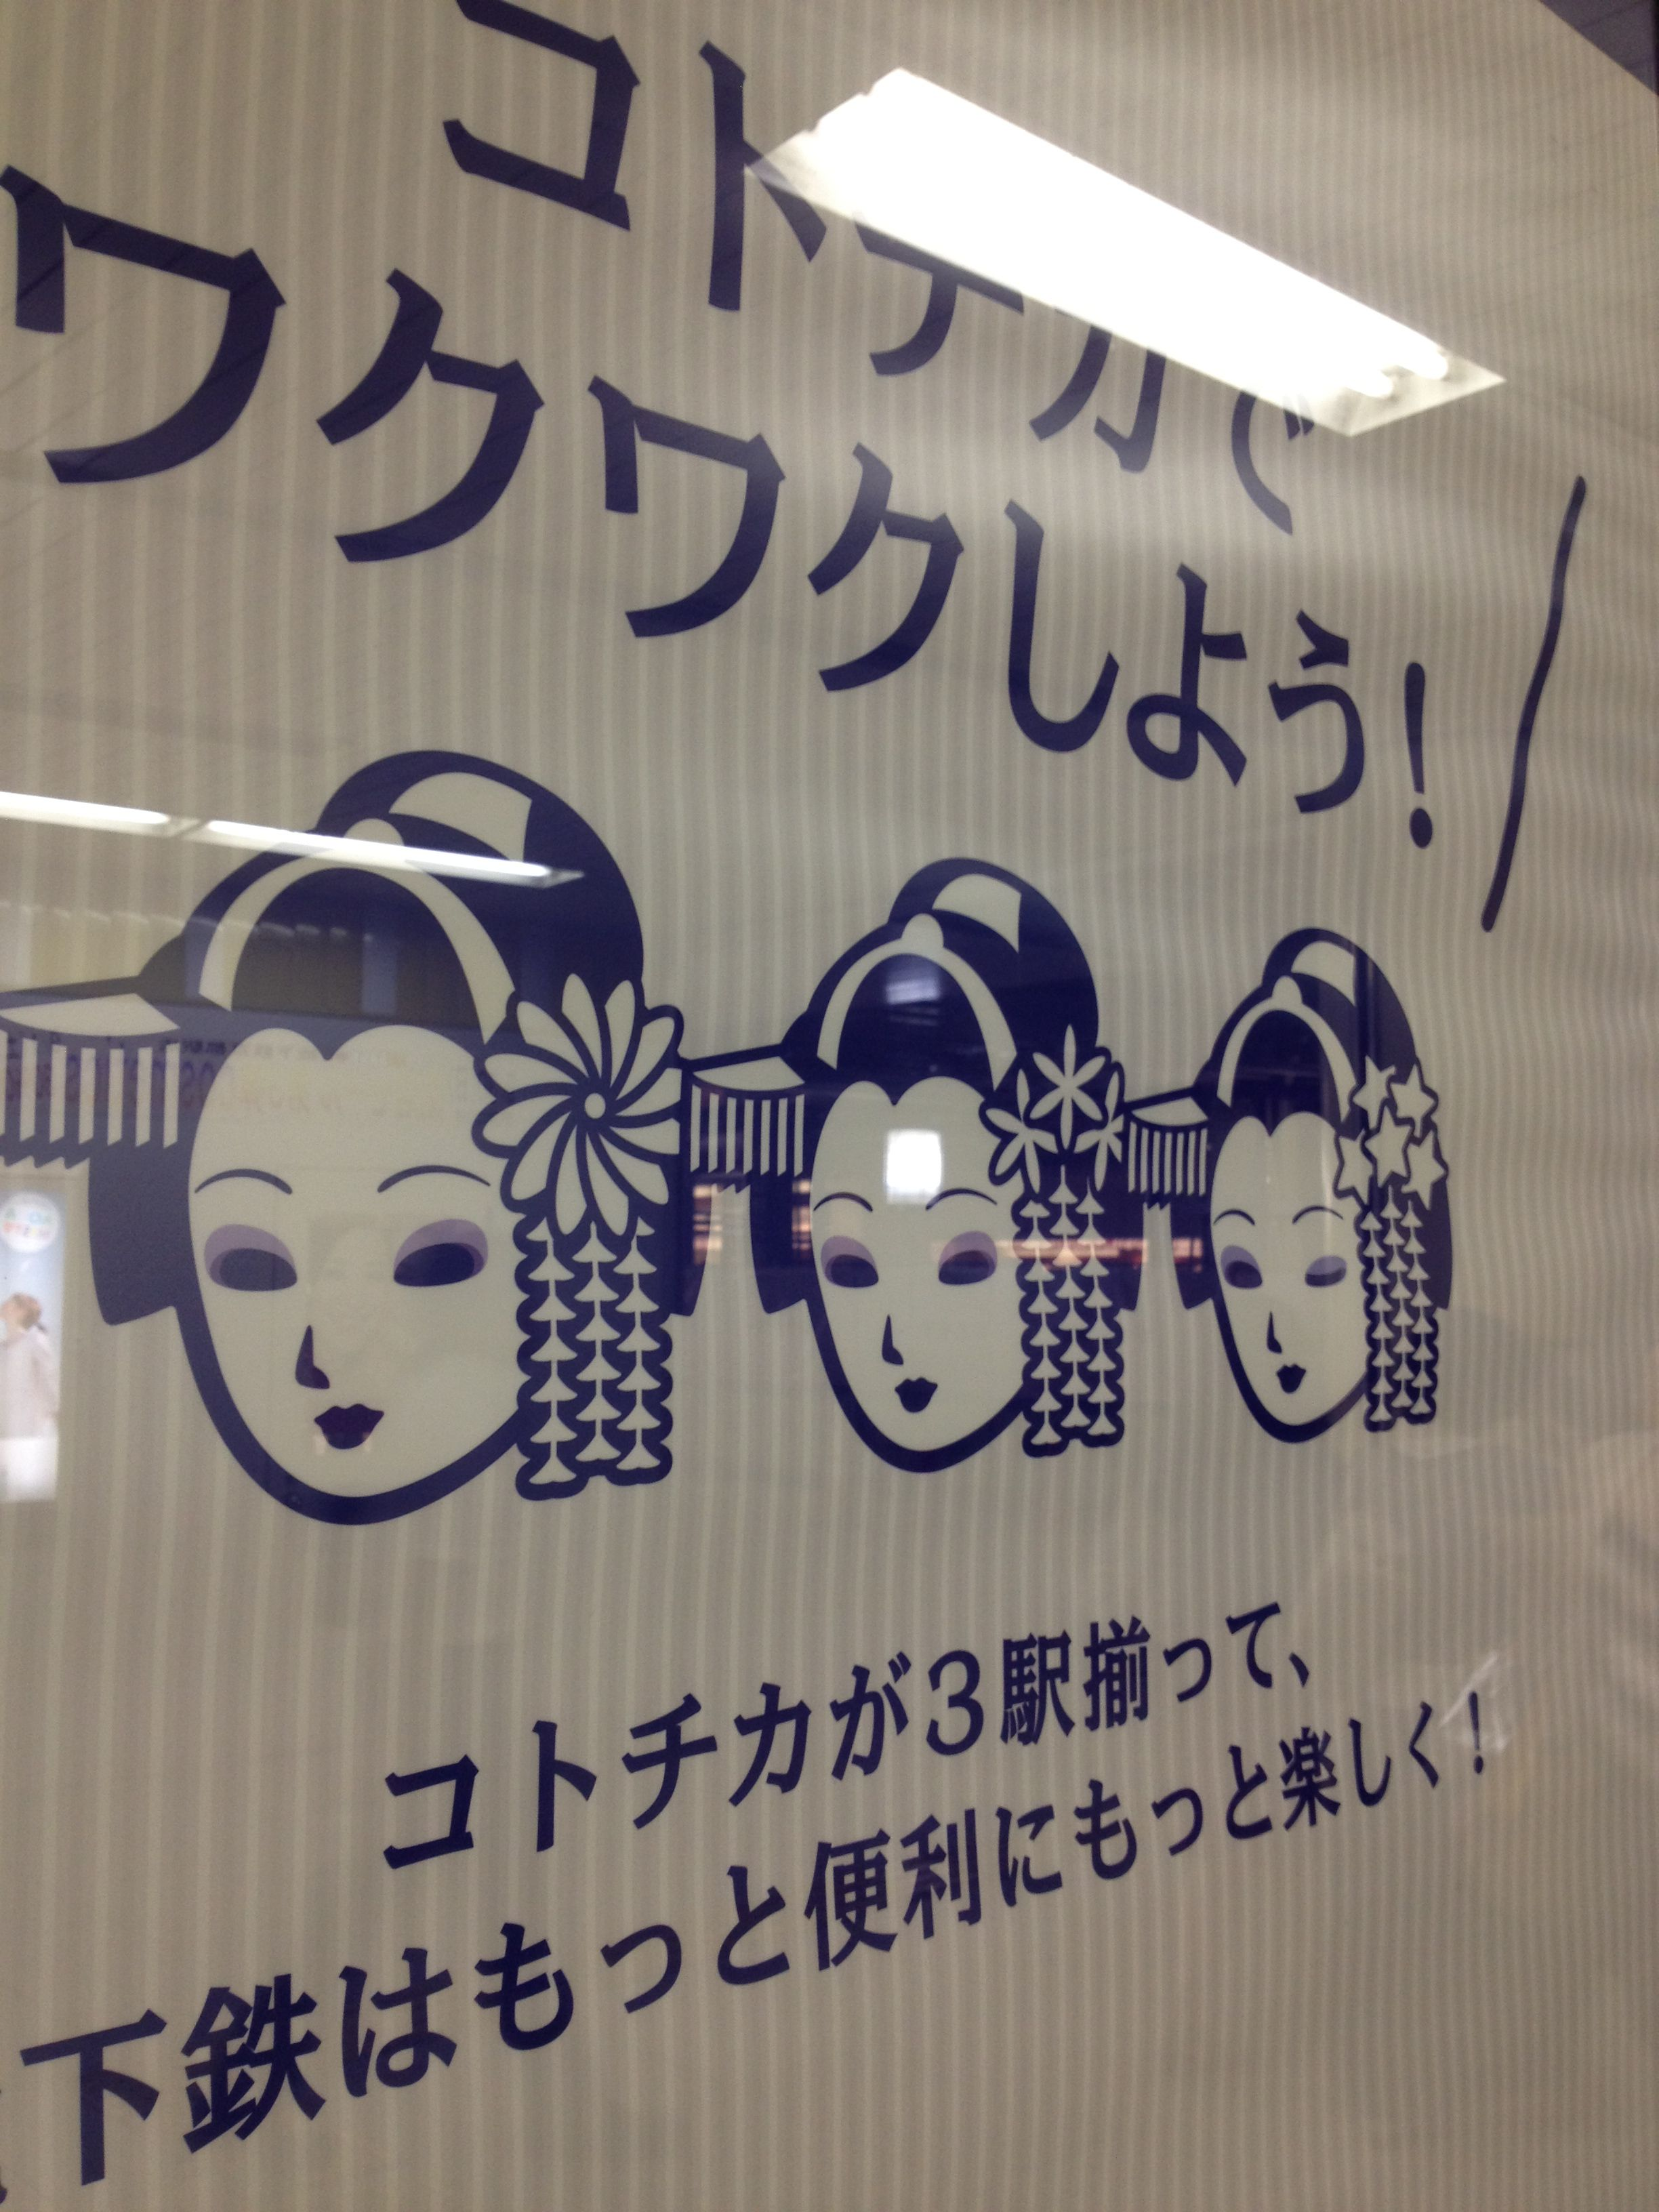 Stylized Geisha dolls, poster in Kyoto Station